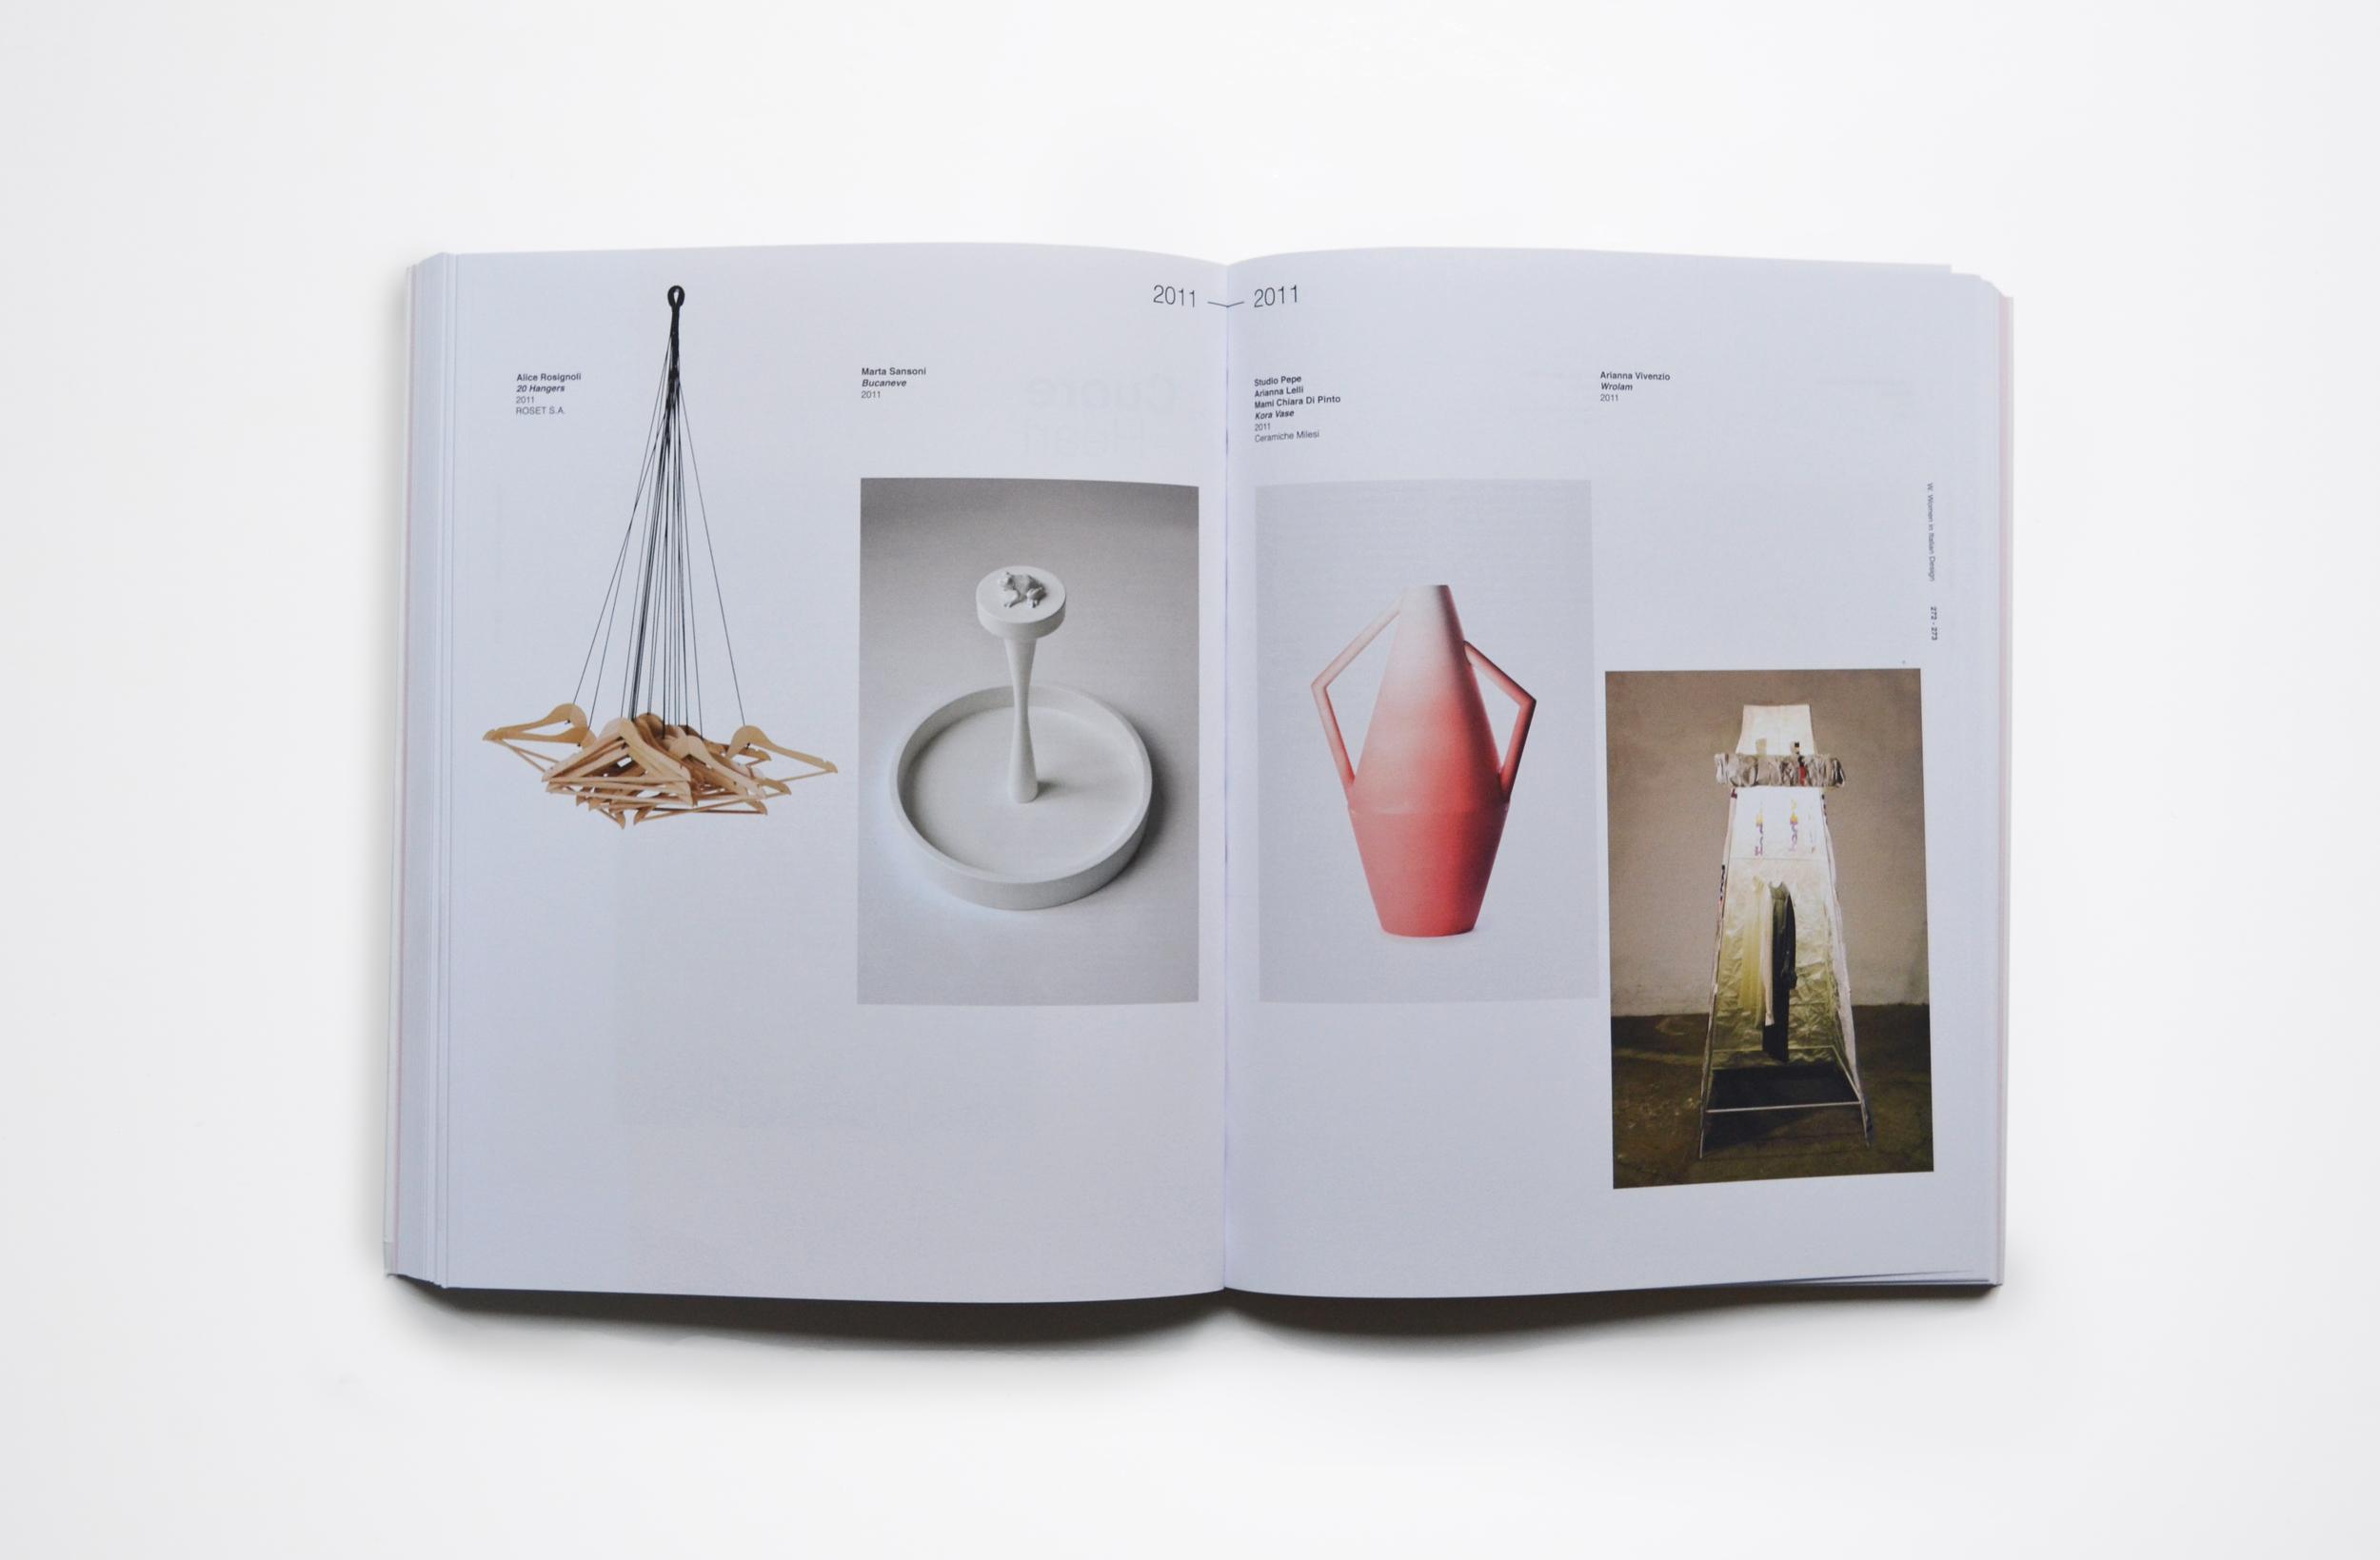 TriennaleDesignMuseum_Catalogue_WWomenInItalianDesign_02.jpg